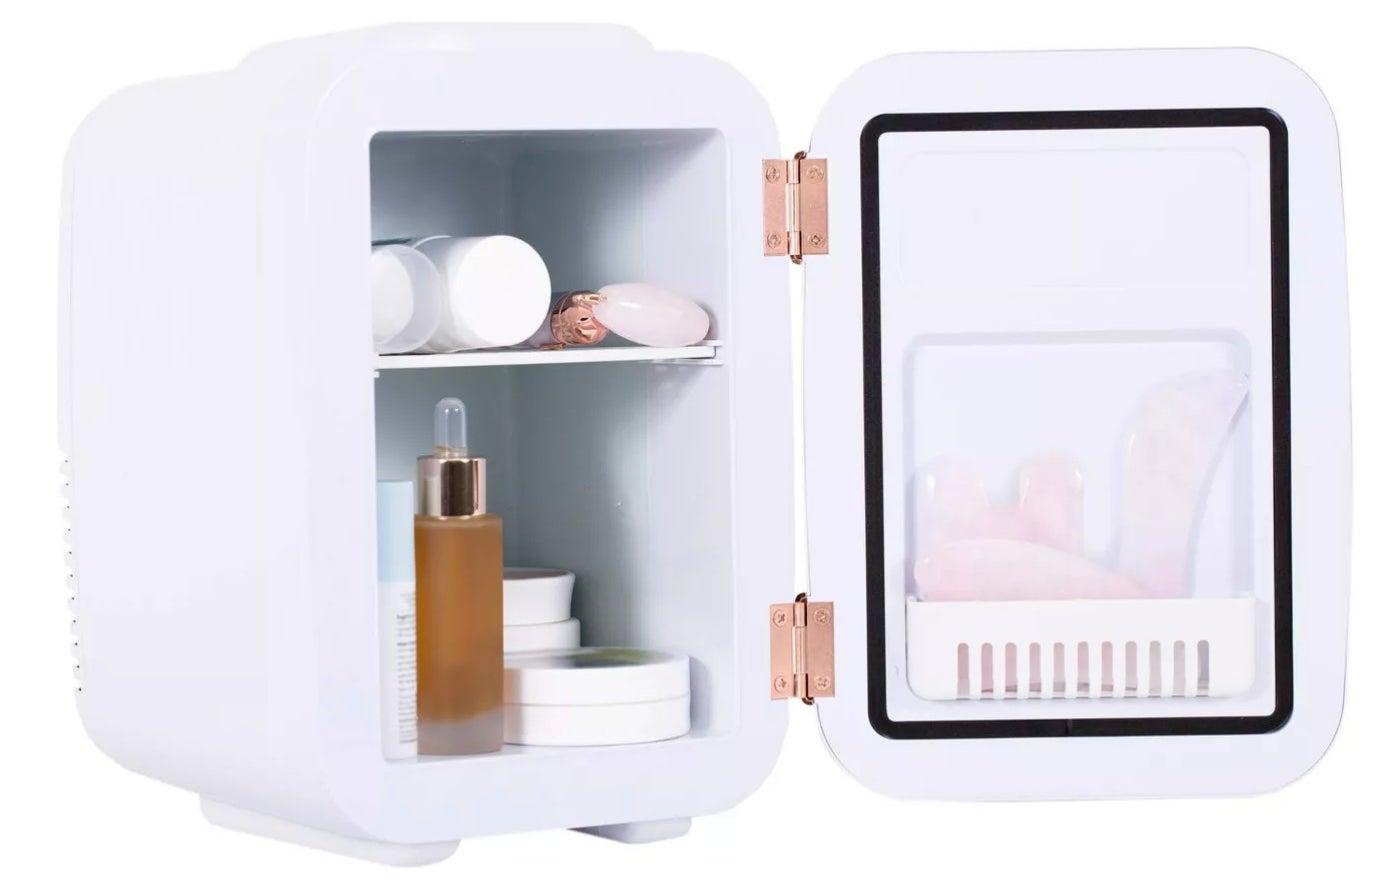 The beauty fridge